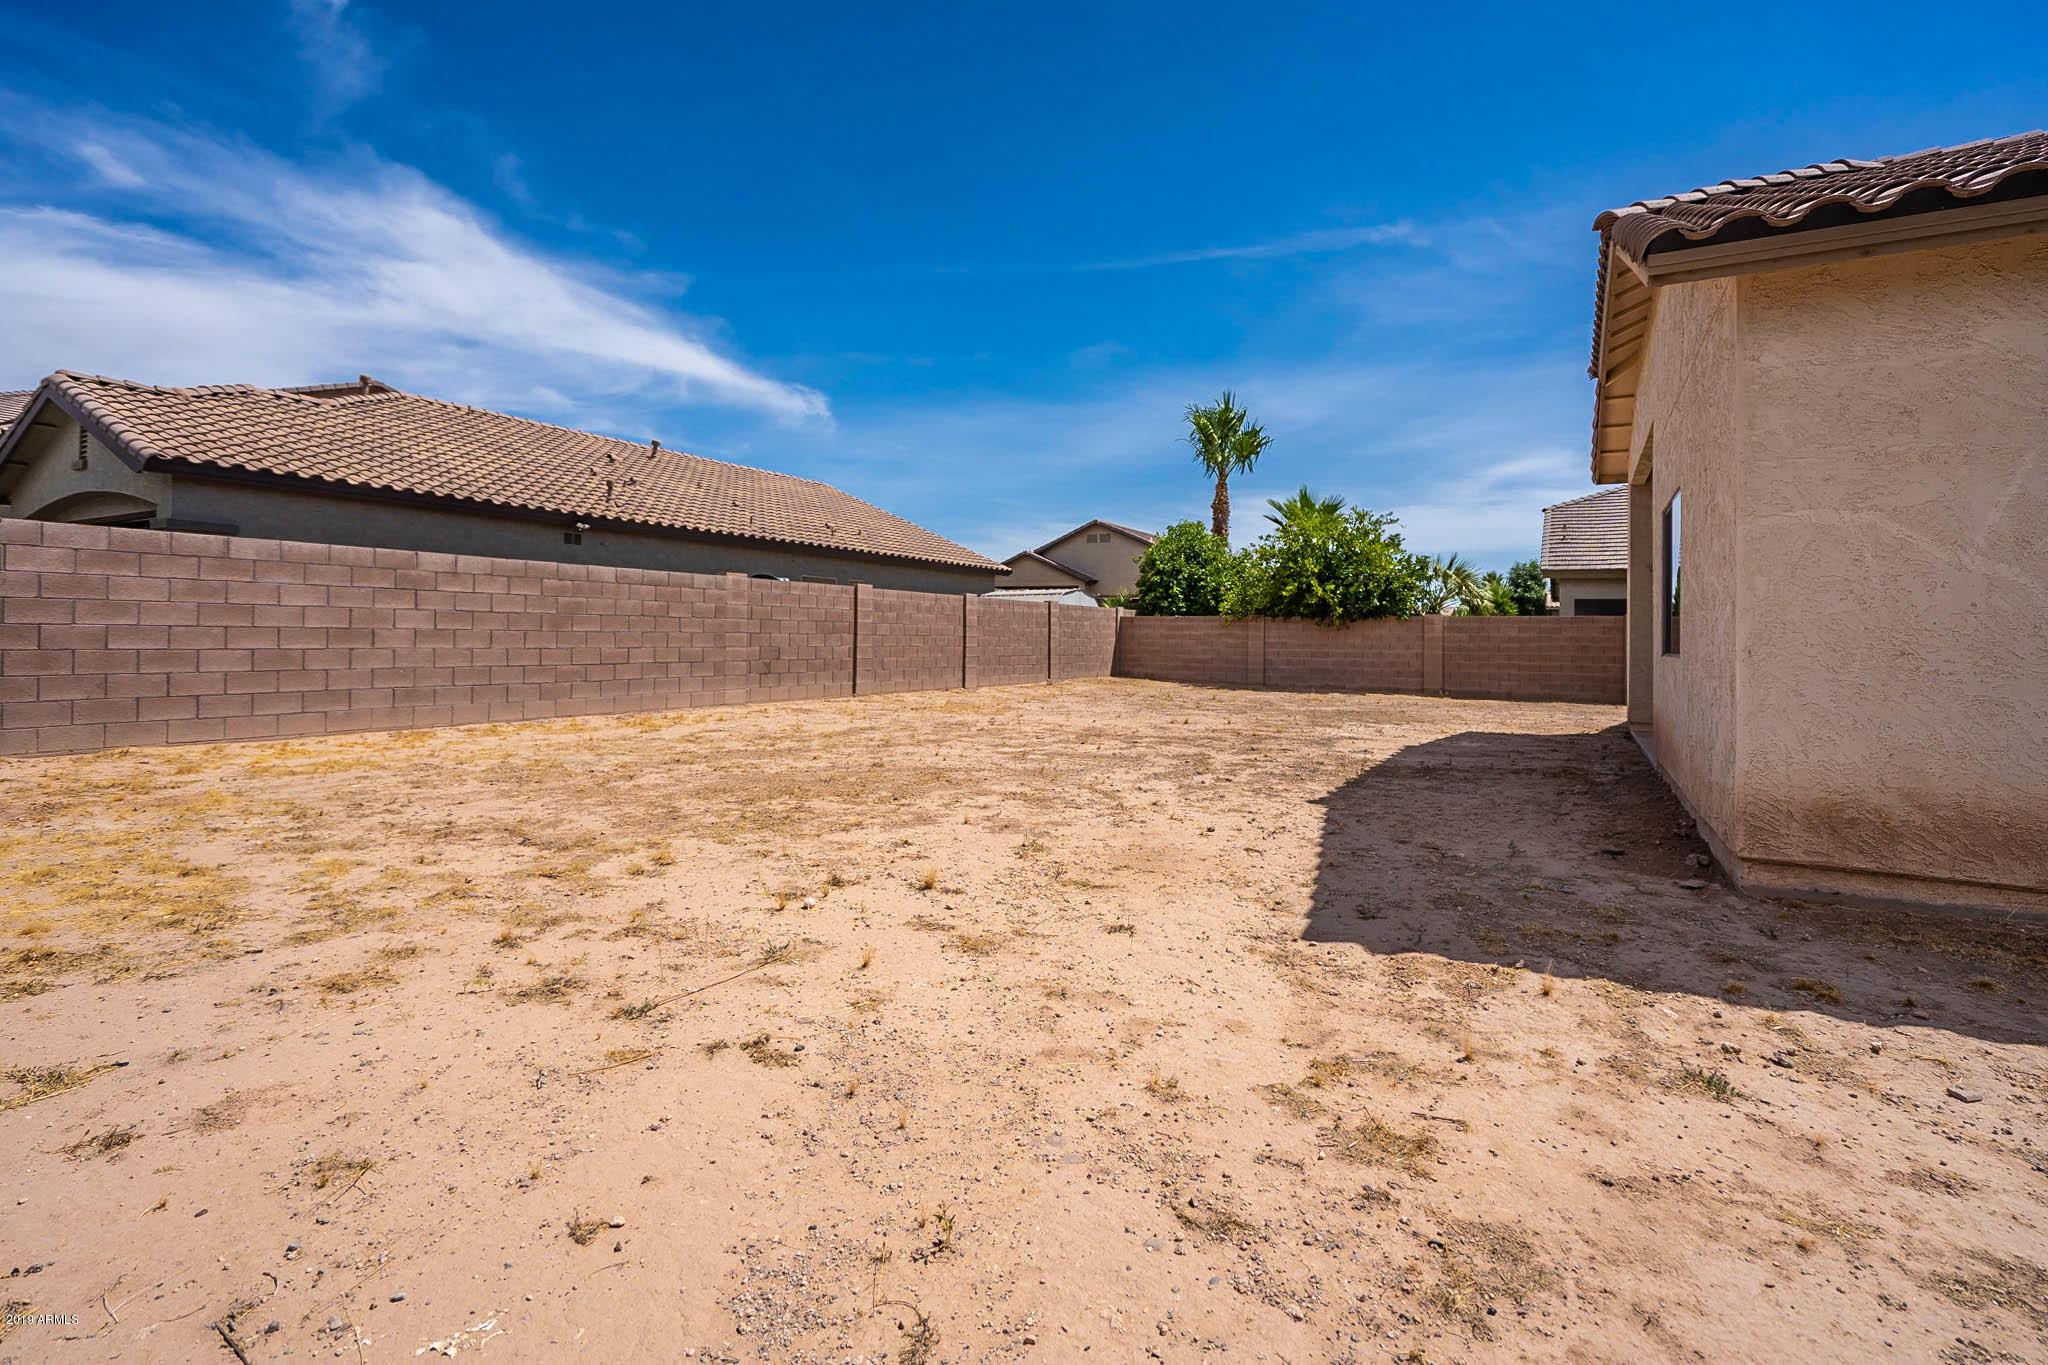 MLS 5938722 22157 N GREENLAND PARK Drive, Maricopa, AZ 85139 Maricopa AZ Cobblestone Farms